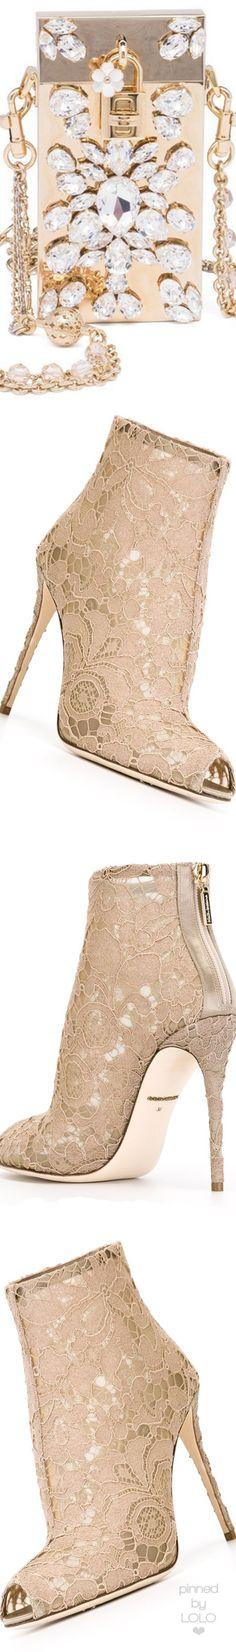 Dolce&Gabbana Mini Crystal-Embellished Metallic Chain Bag | LOLO❤︎